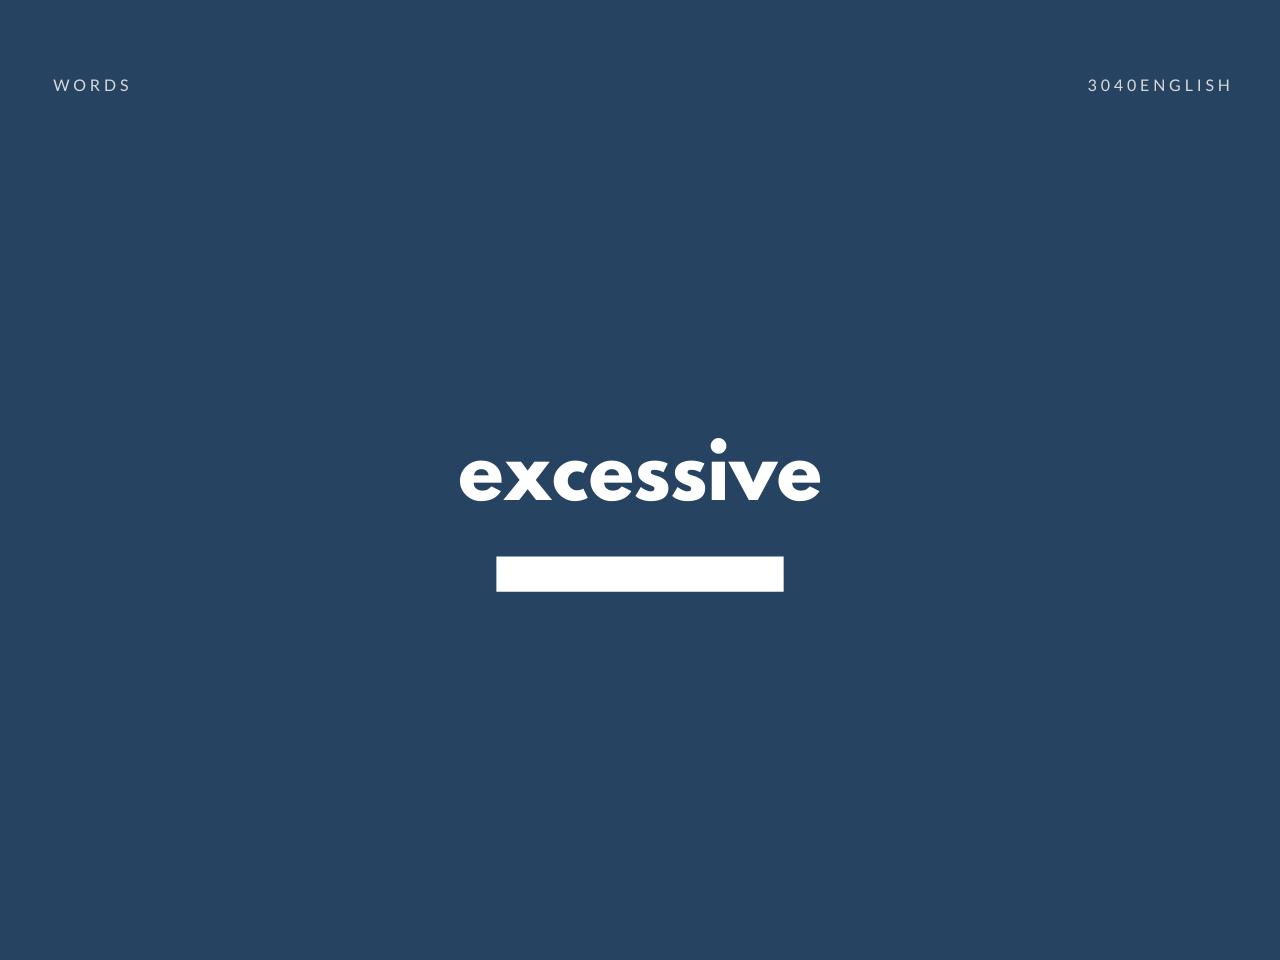 excessive の意味と簡単な使い方【音読用例文あり】